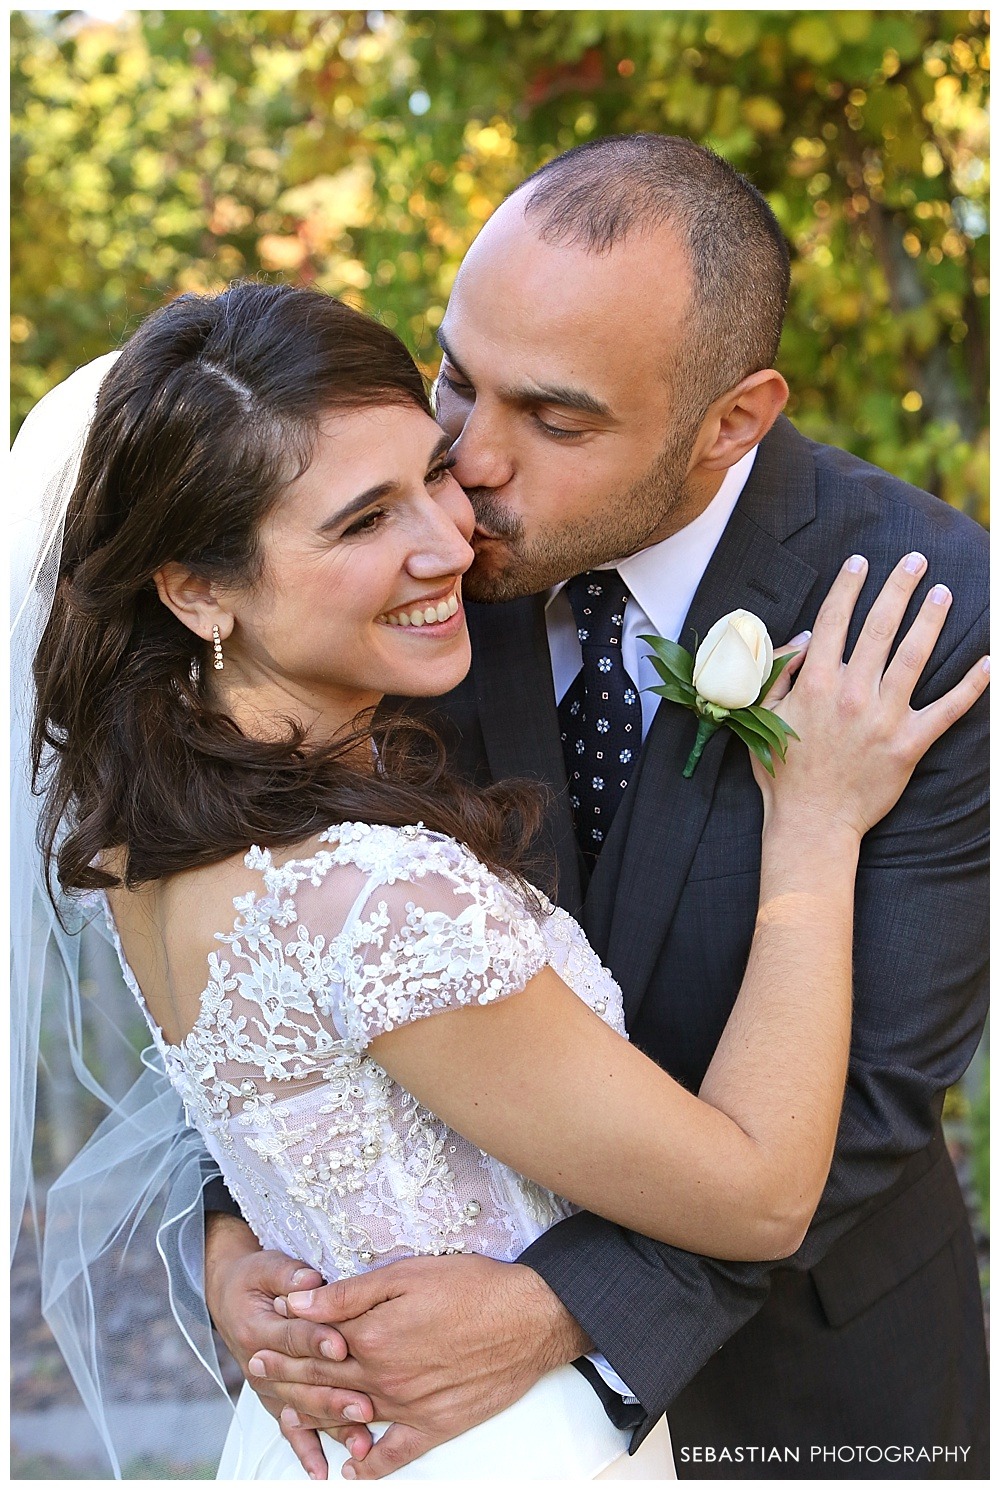 Sebastian_Photography_Studio_Wedding_Connecticut_Bride_Groom_Backyard_Fall_Autumn_NewEngland_033.jpg